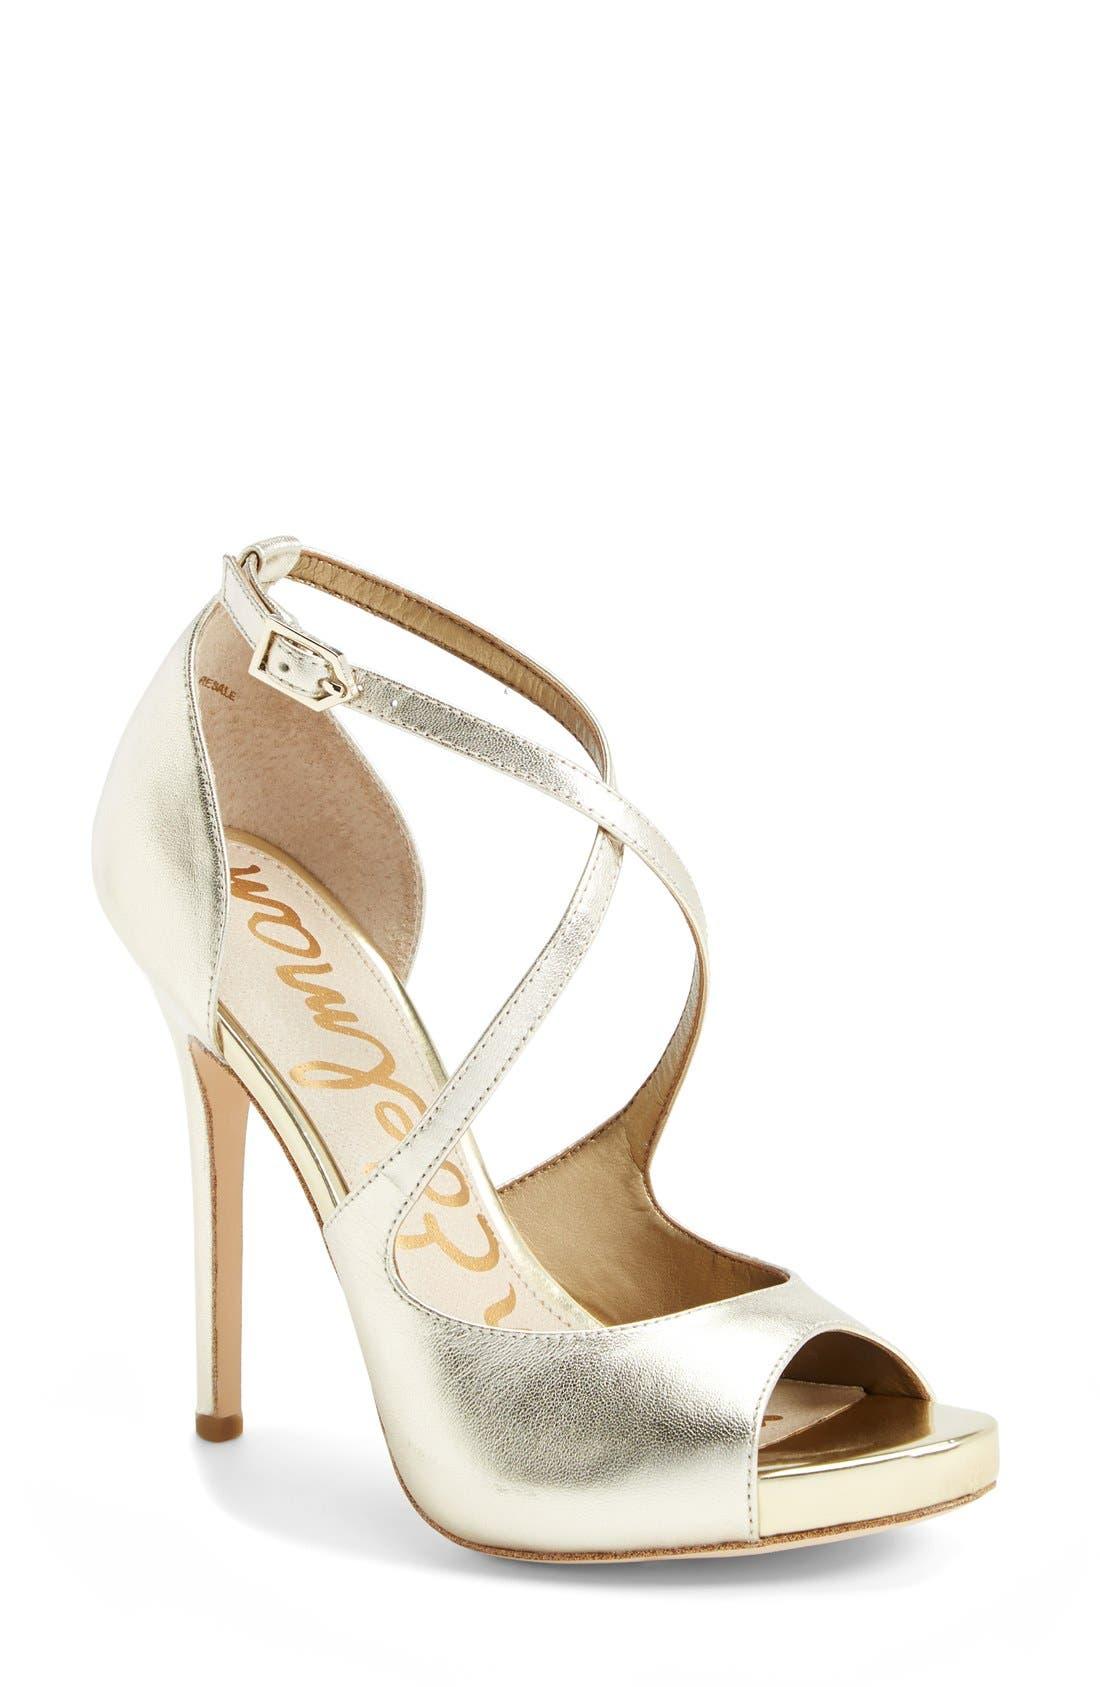 Main Image - Sam Edelman 'Elizabeth' Metallic Leather Sandal (Women)